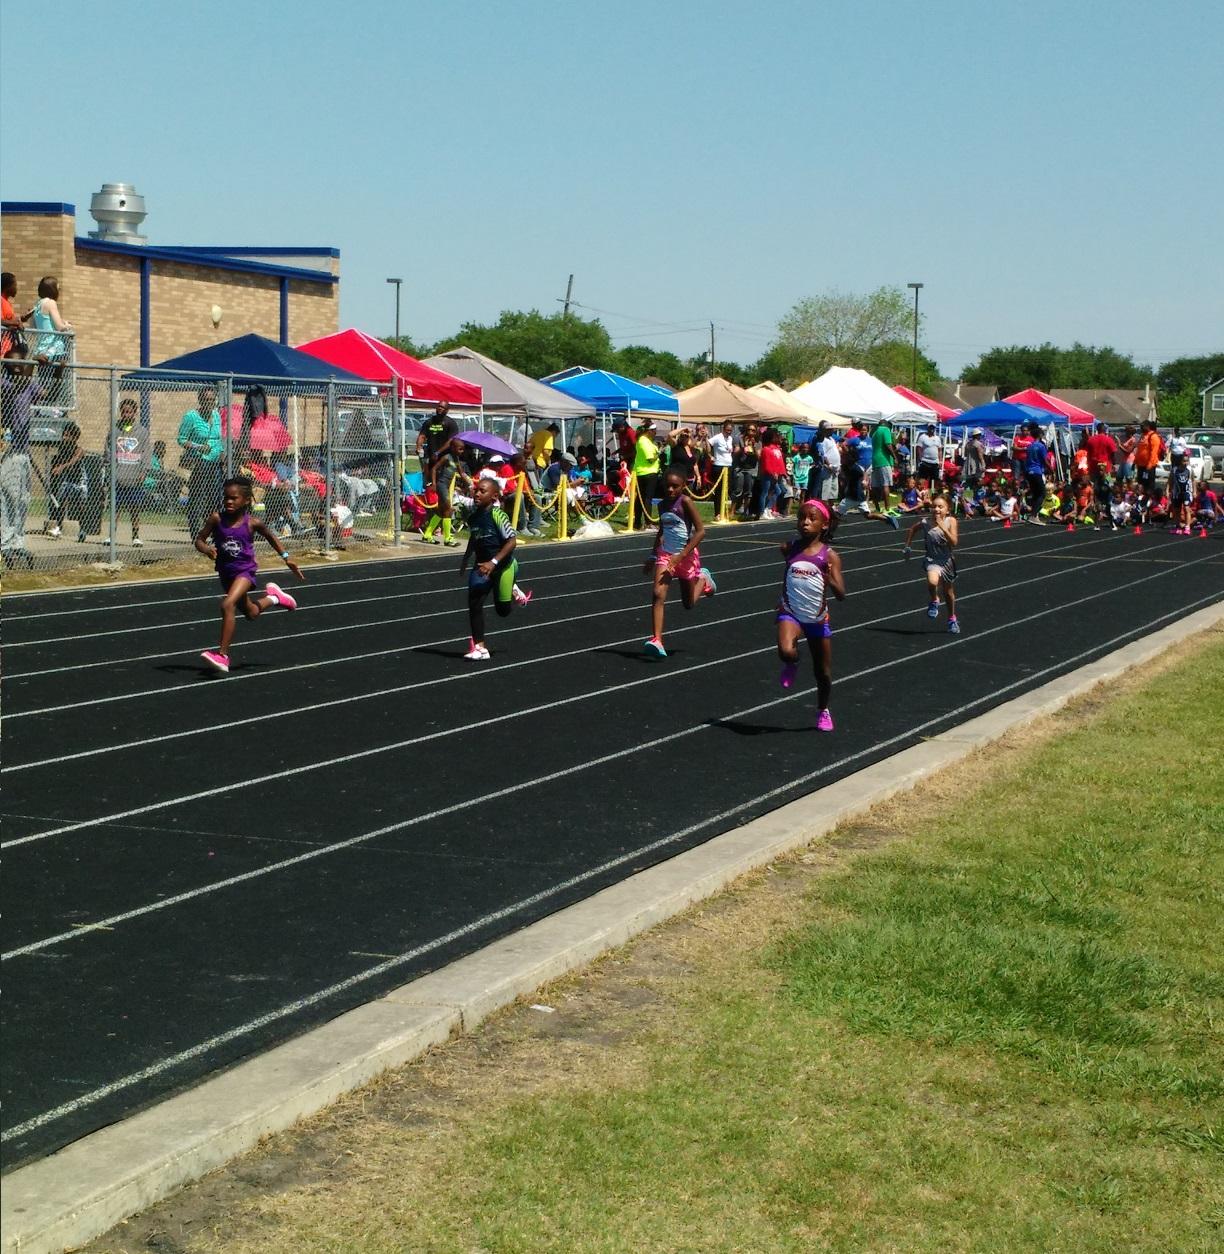 Ryann running the 100